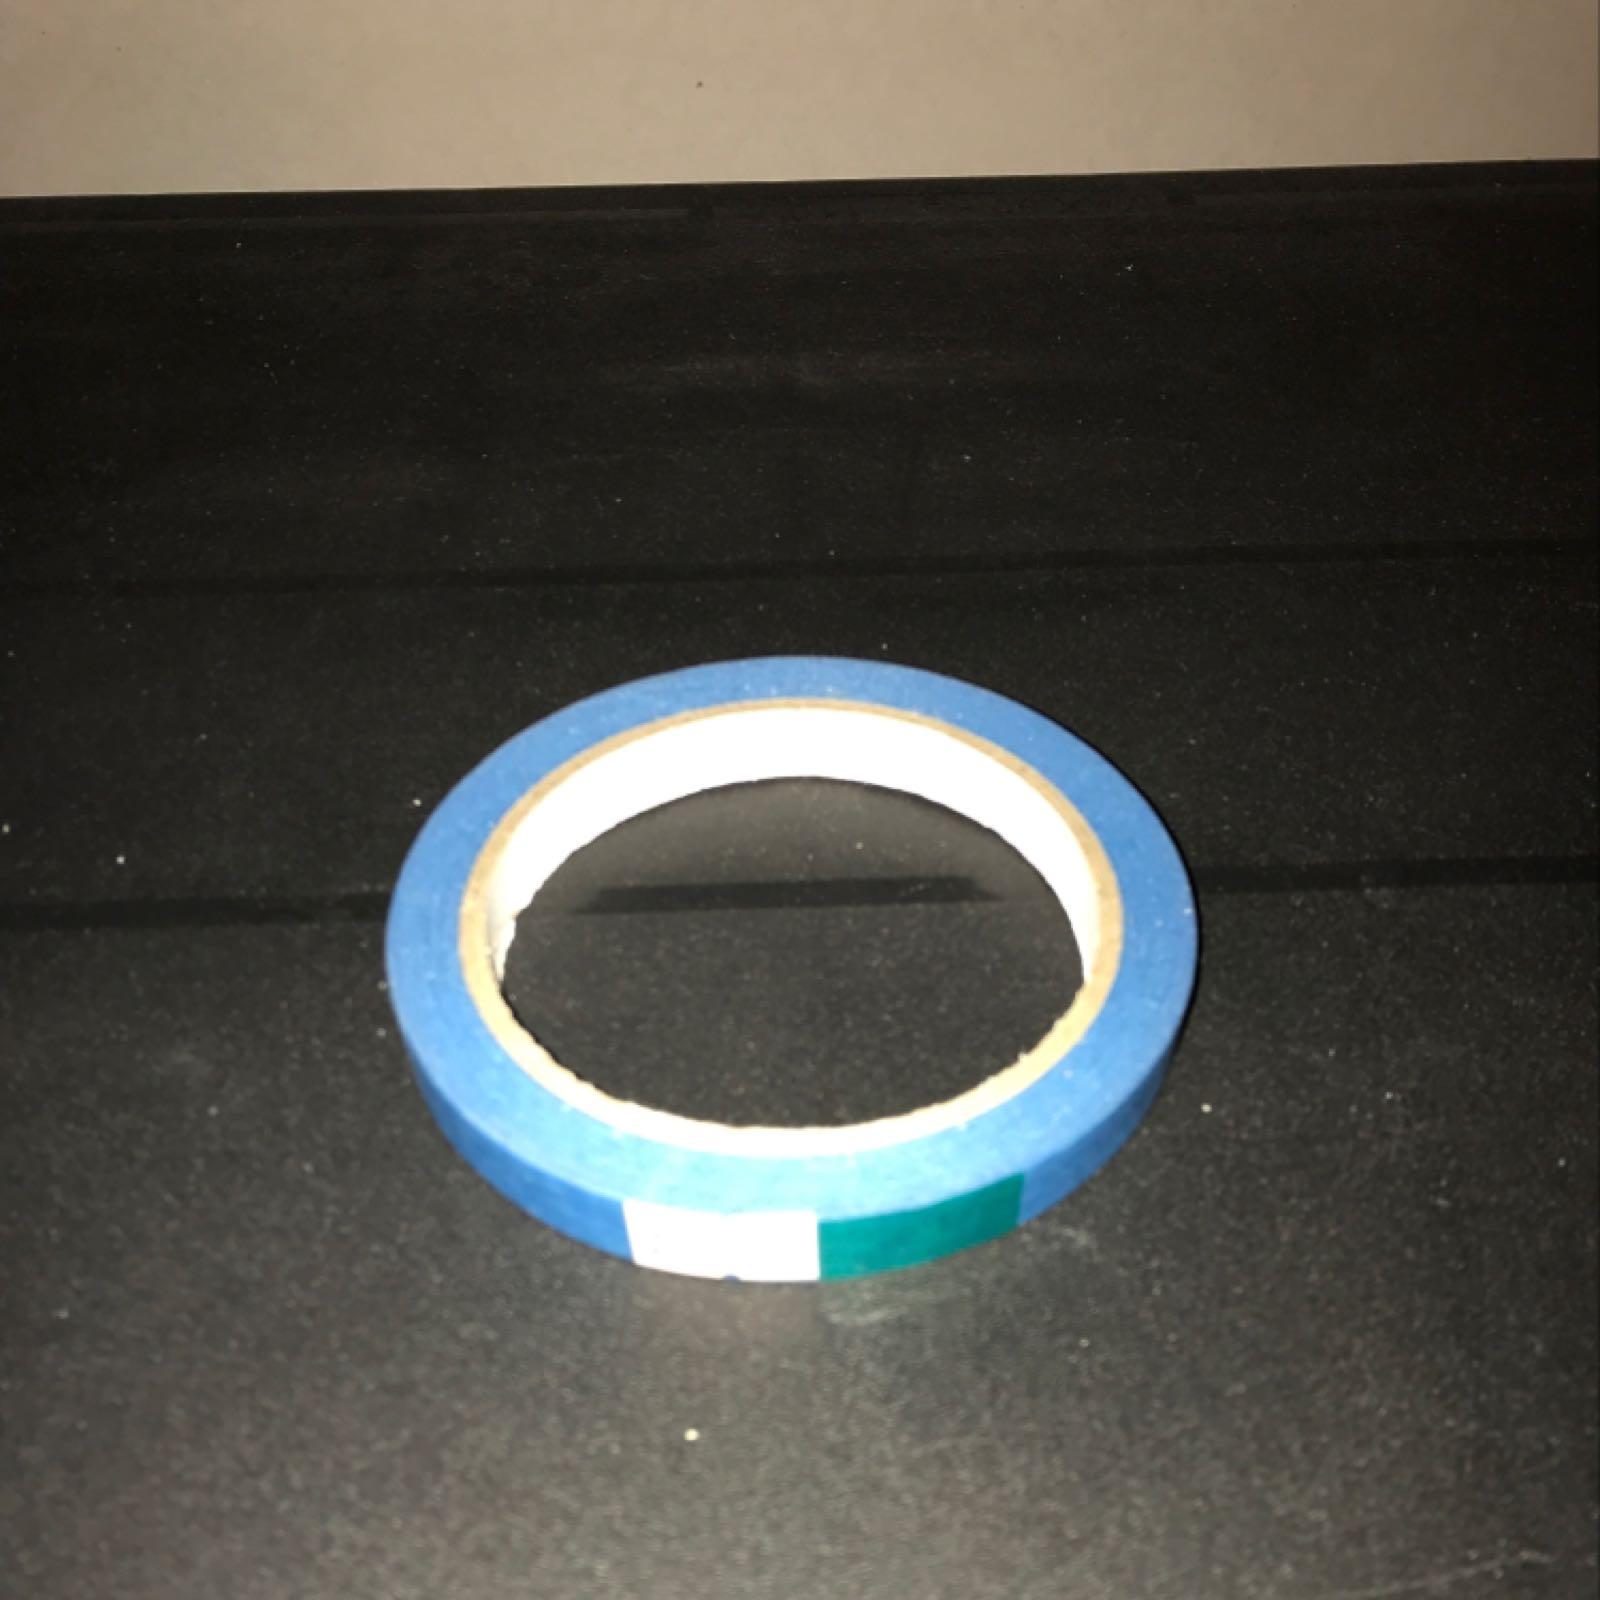 Detailing Tape Blue